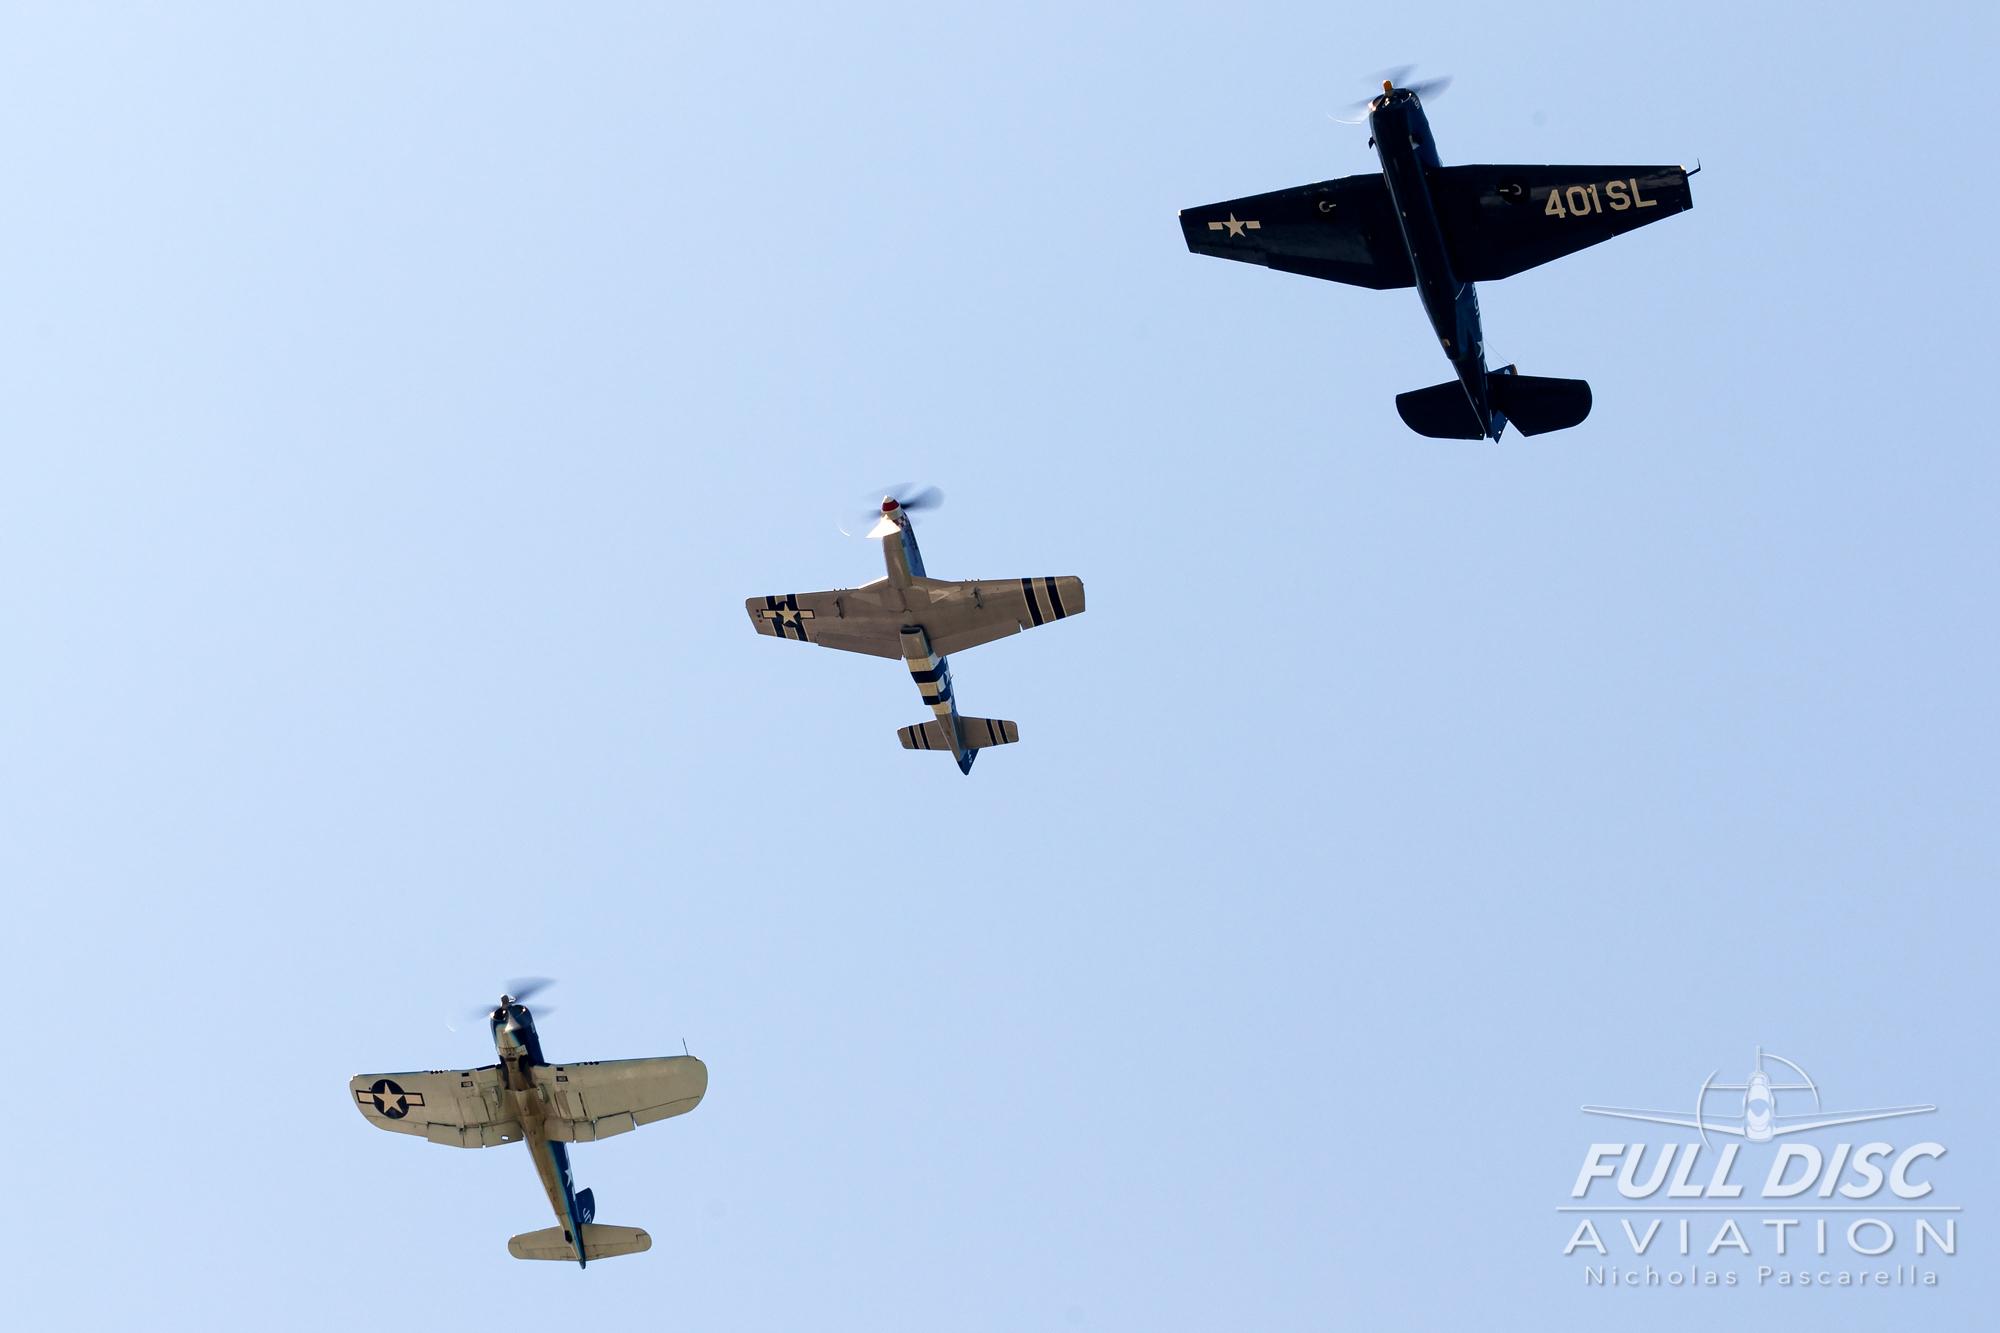 americanairpowermuseum_nicholaspascarella_nickpascarella_fulldiscaviation_legendsofairpower2019_aviation_warbird_formationflight_corsair_mustang_tbmavenger_p51_f4u.jpg